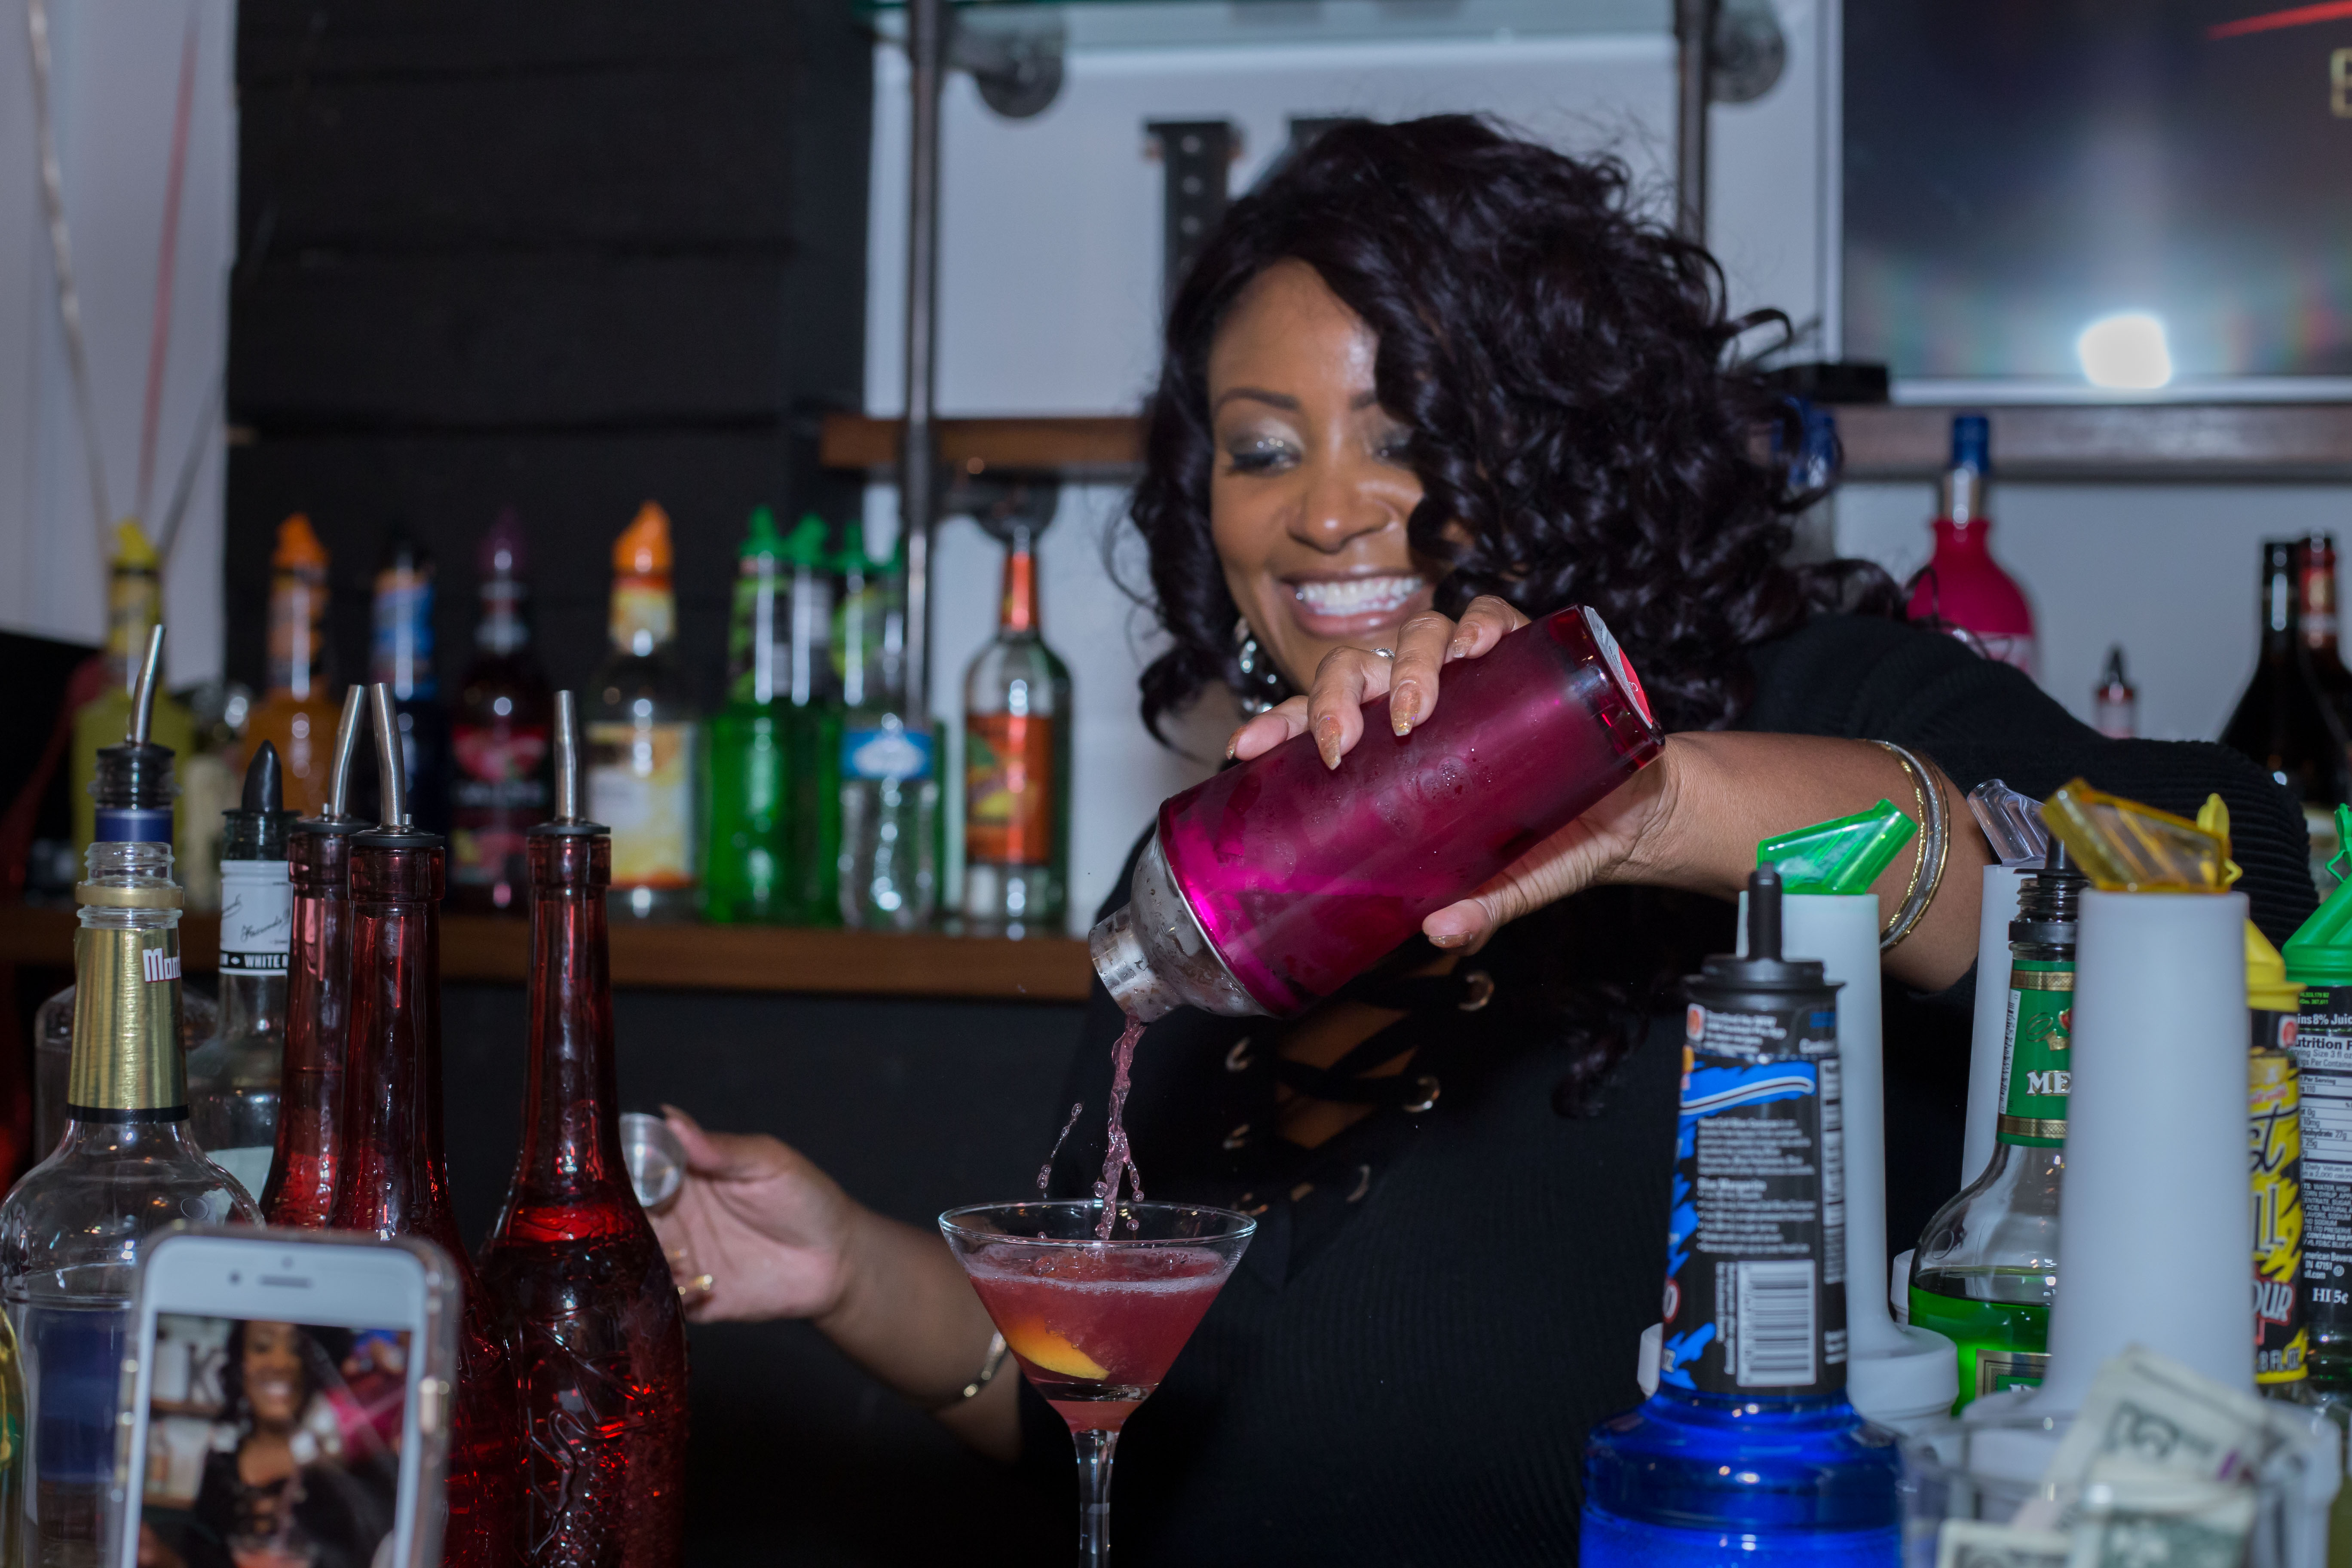 La'Creays Martini